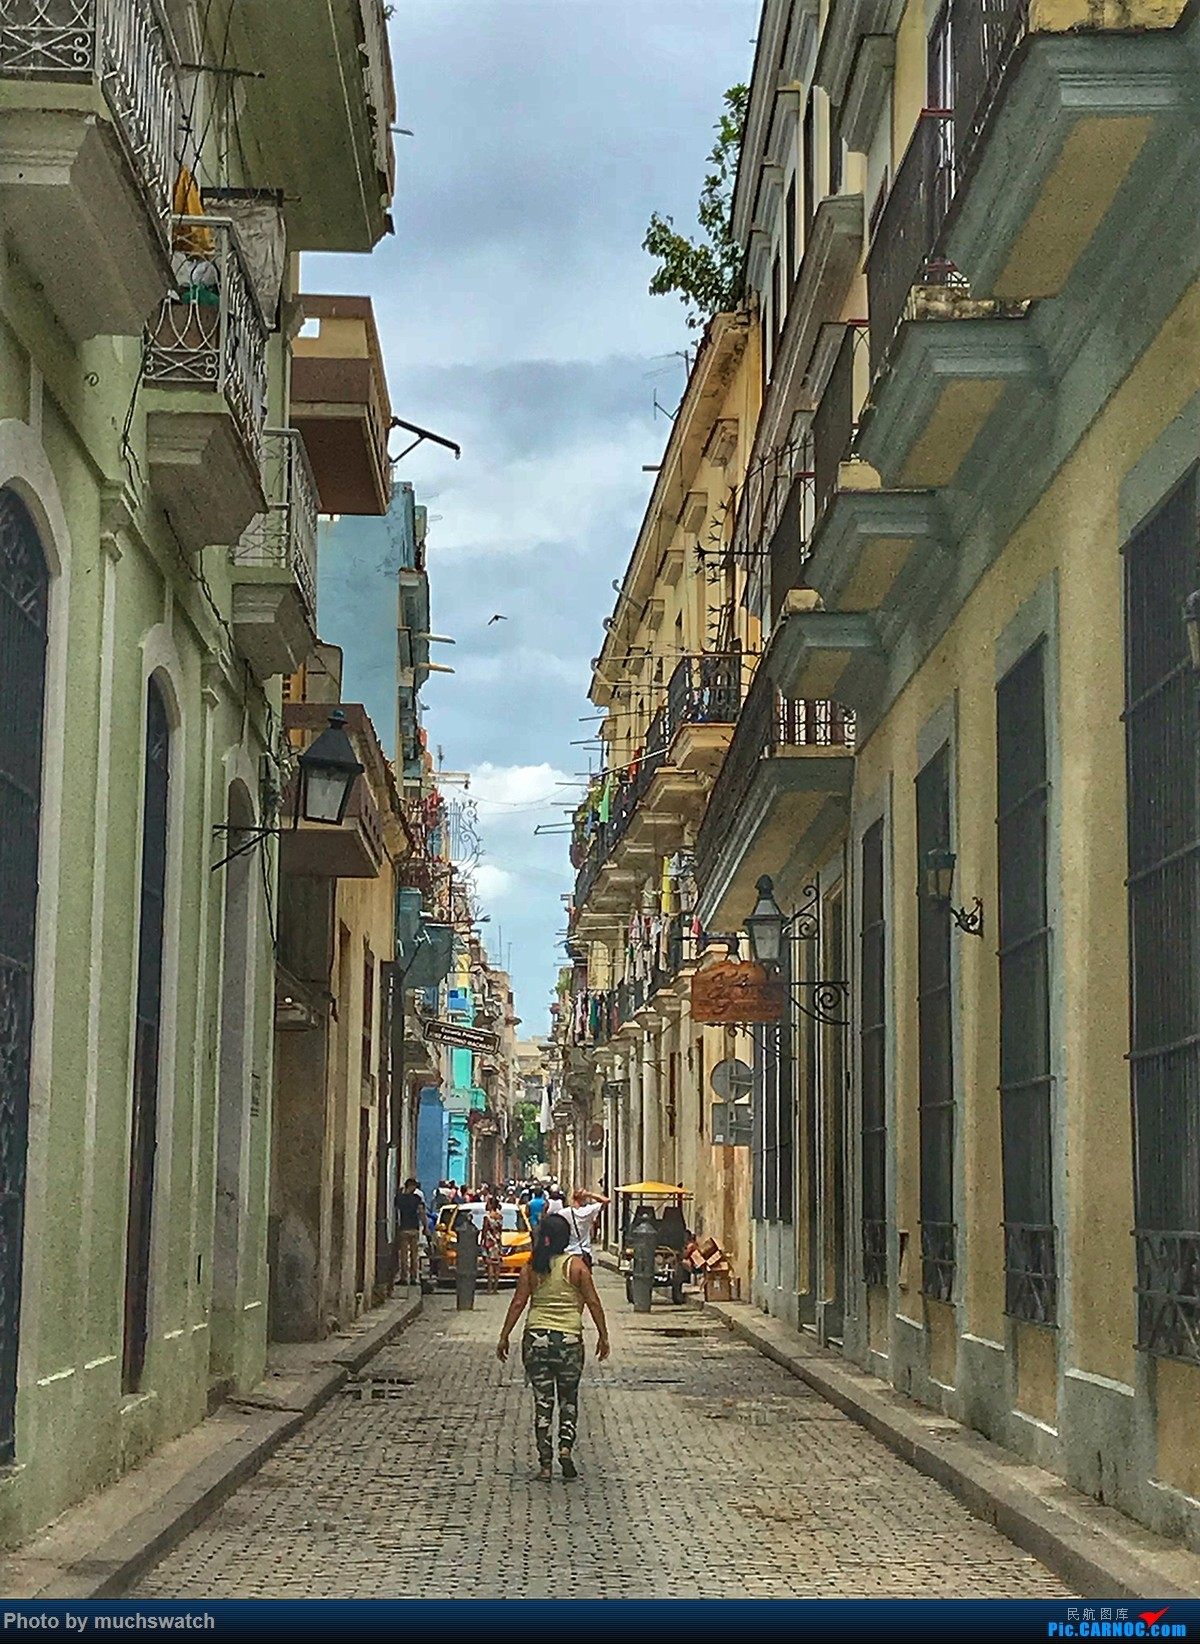 Re:[原创]一篇被遗忘的游记:5月带老妈古巴行, SUNWING YYZ-VRA,懒人全程手机拍摄,请将就看